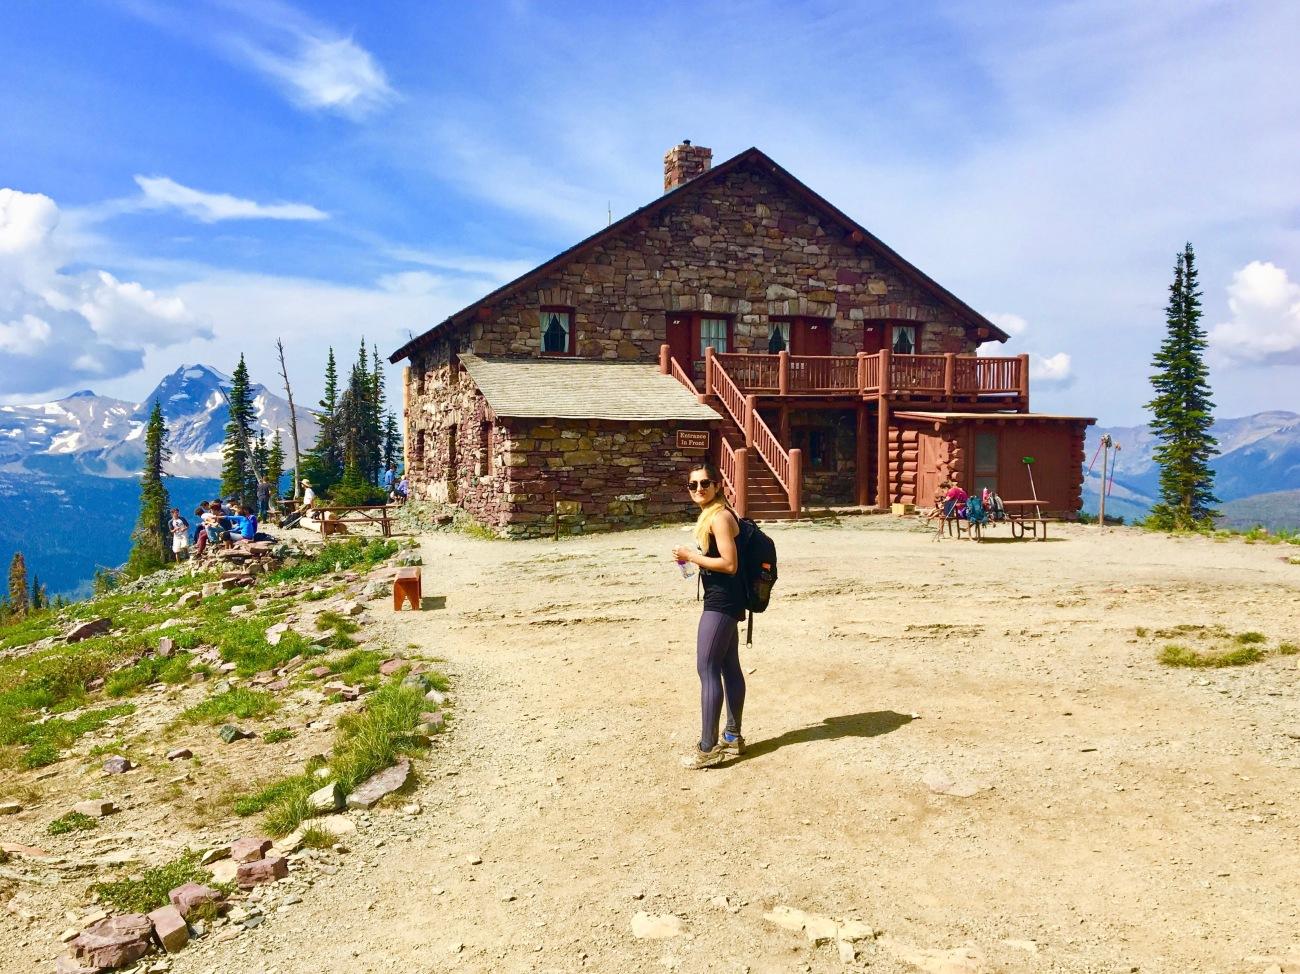 national parks, glacier national park, grinnell, highline, trail, hikes, adventure, forest, wildlife, wildflowers, nature granite park chalet